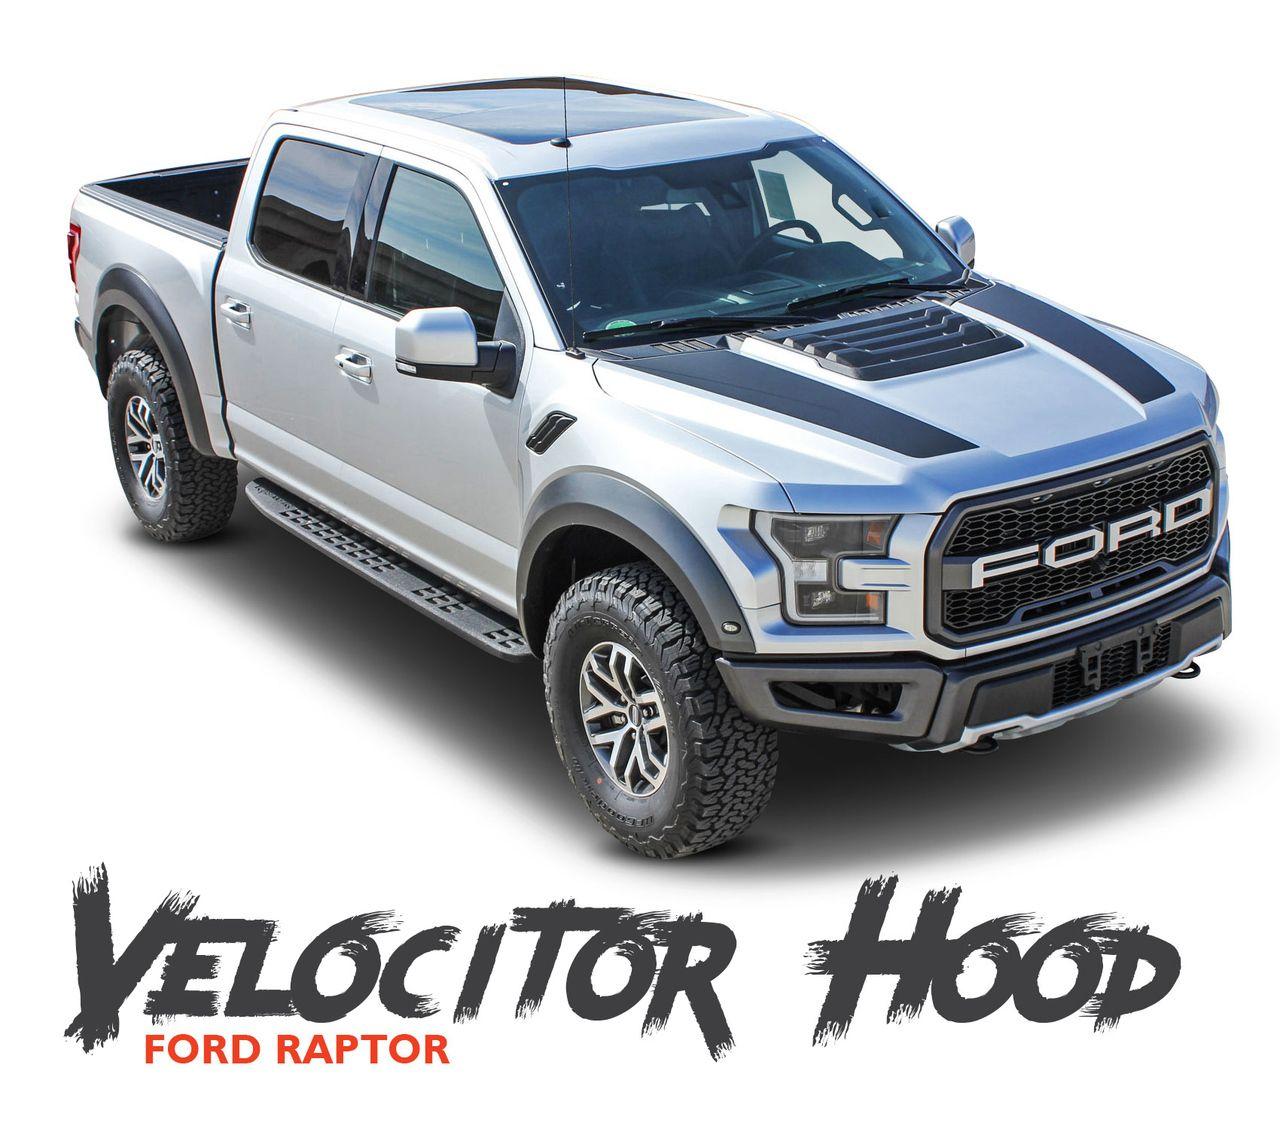 Ford Raptor Hood Stripes Velocitor Hood Decals Vinyl Graphics Kit 2018 2019 2020 Ford Raptor Vinyl Graphics Hood Stripe